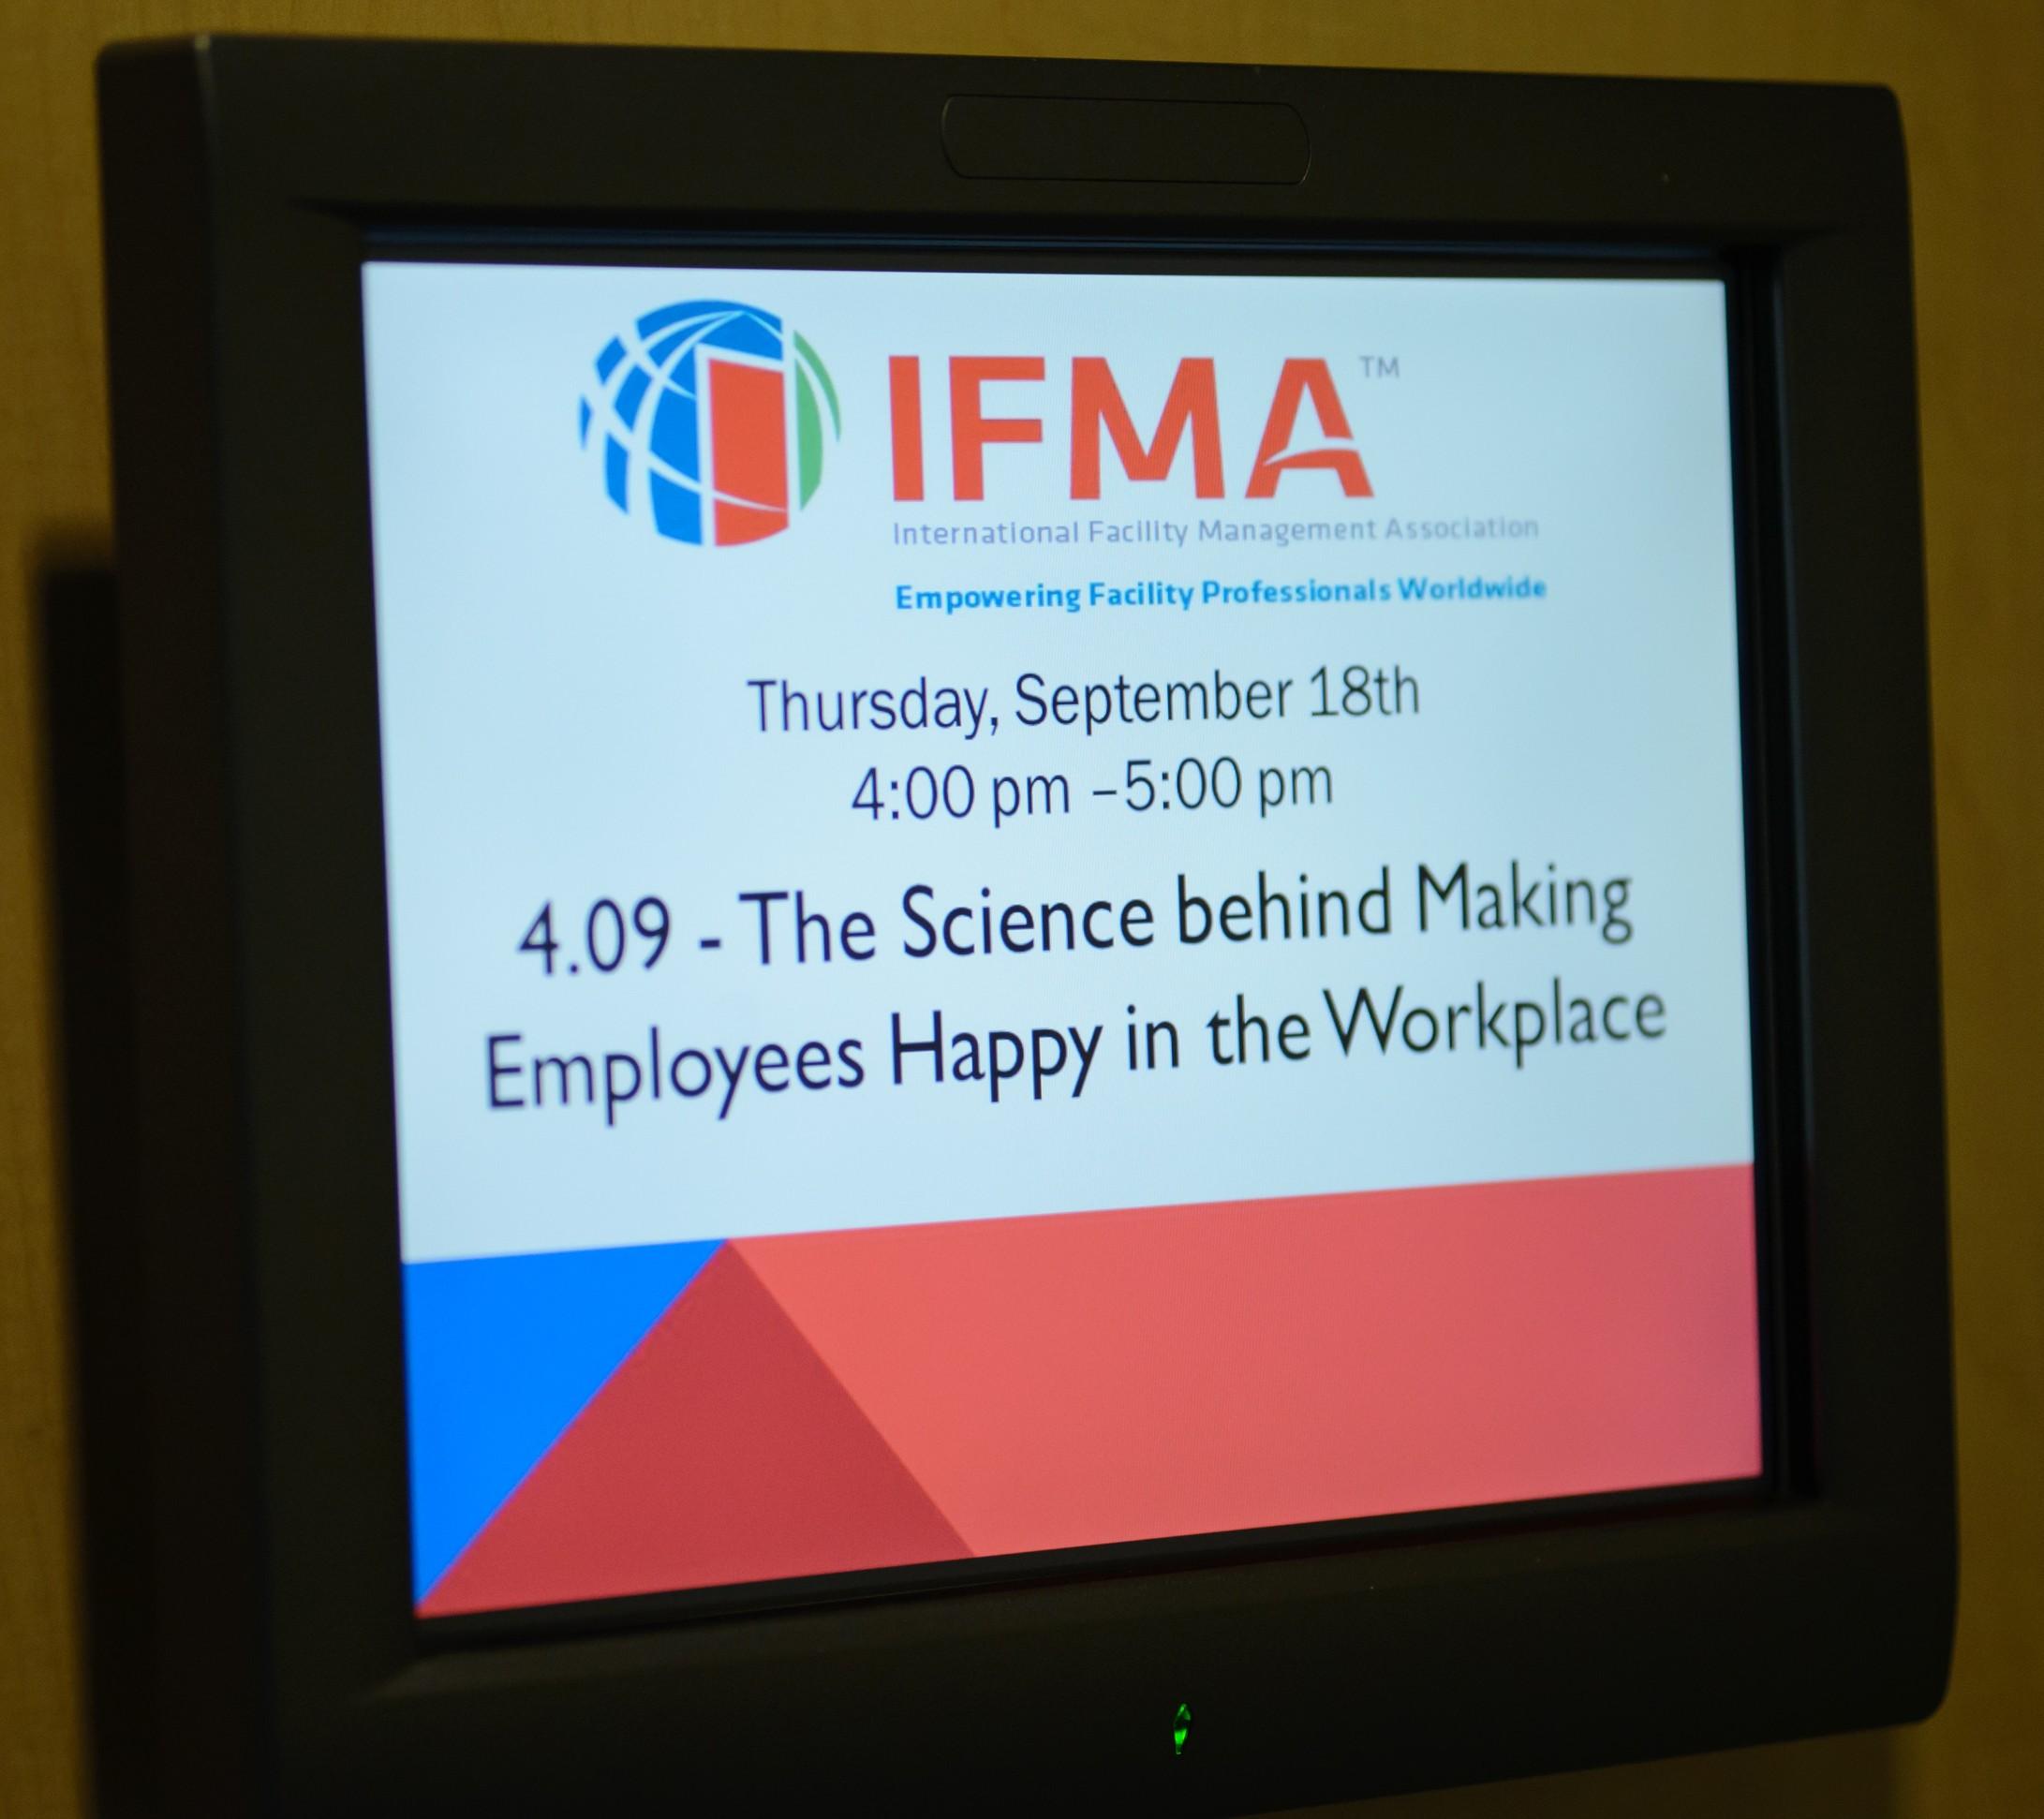 IFMA14-1453